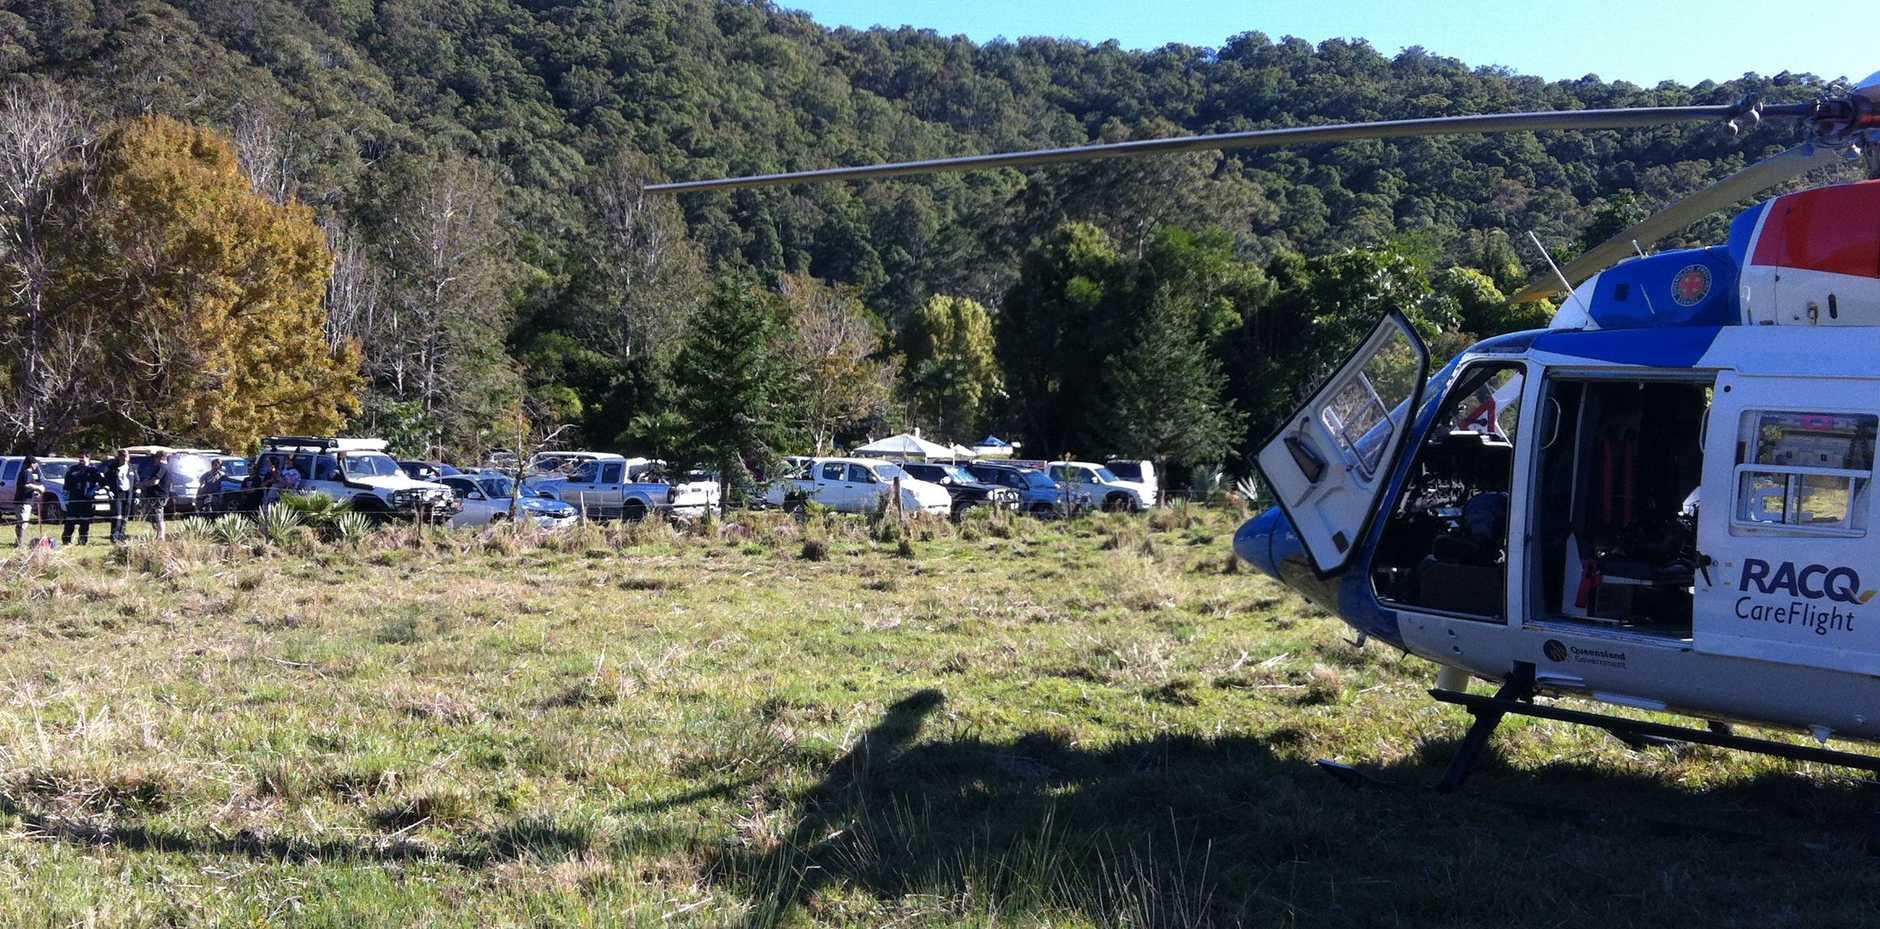 RACQ CareFlight Rescue on scene in Gheerula.